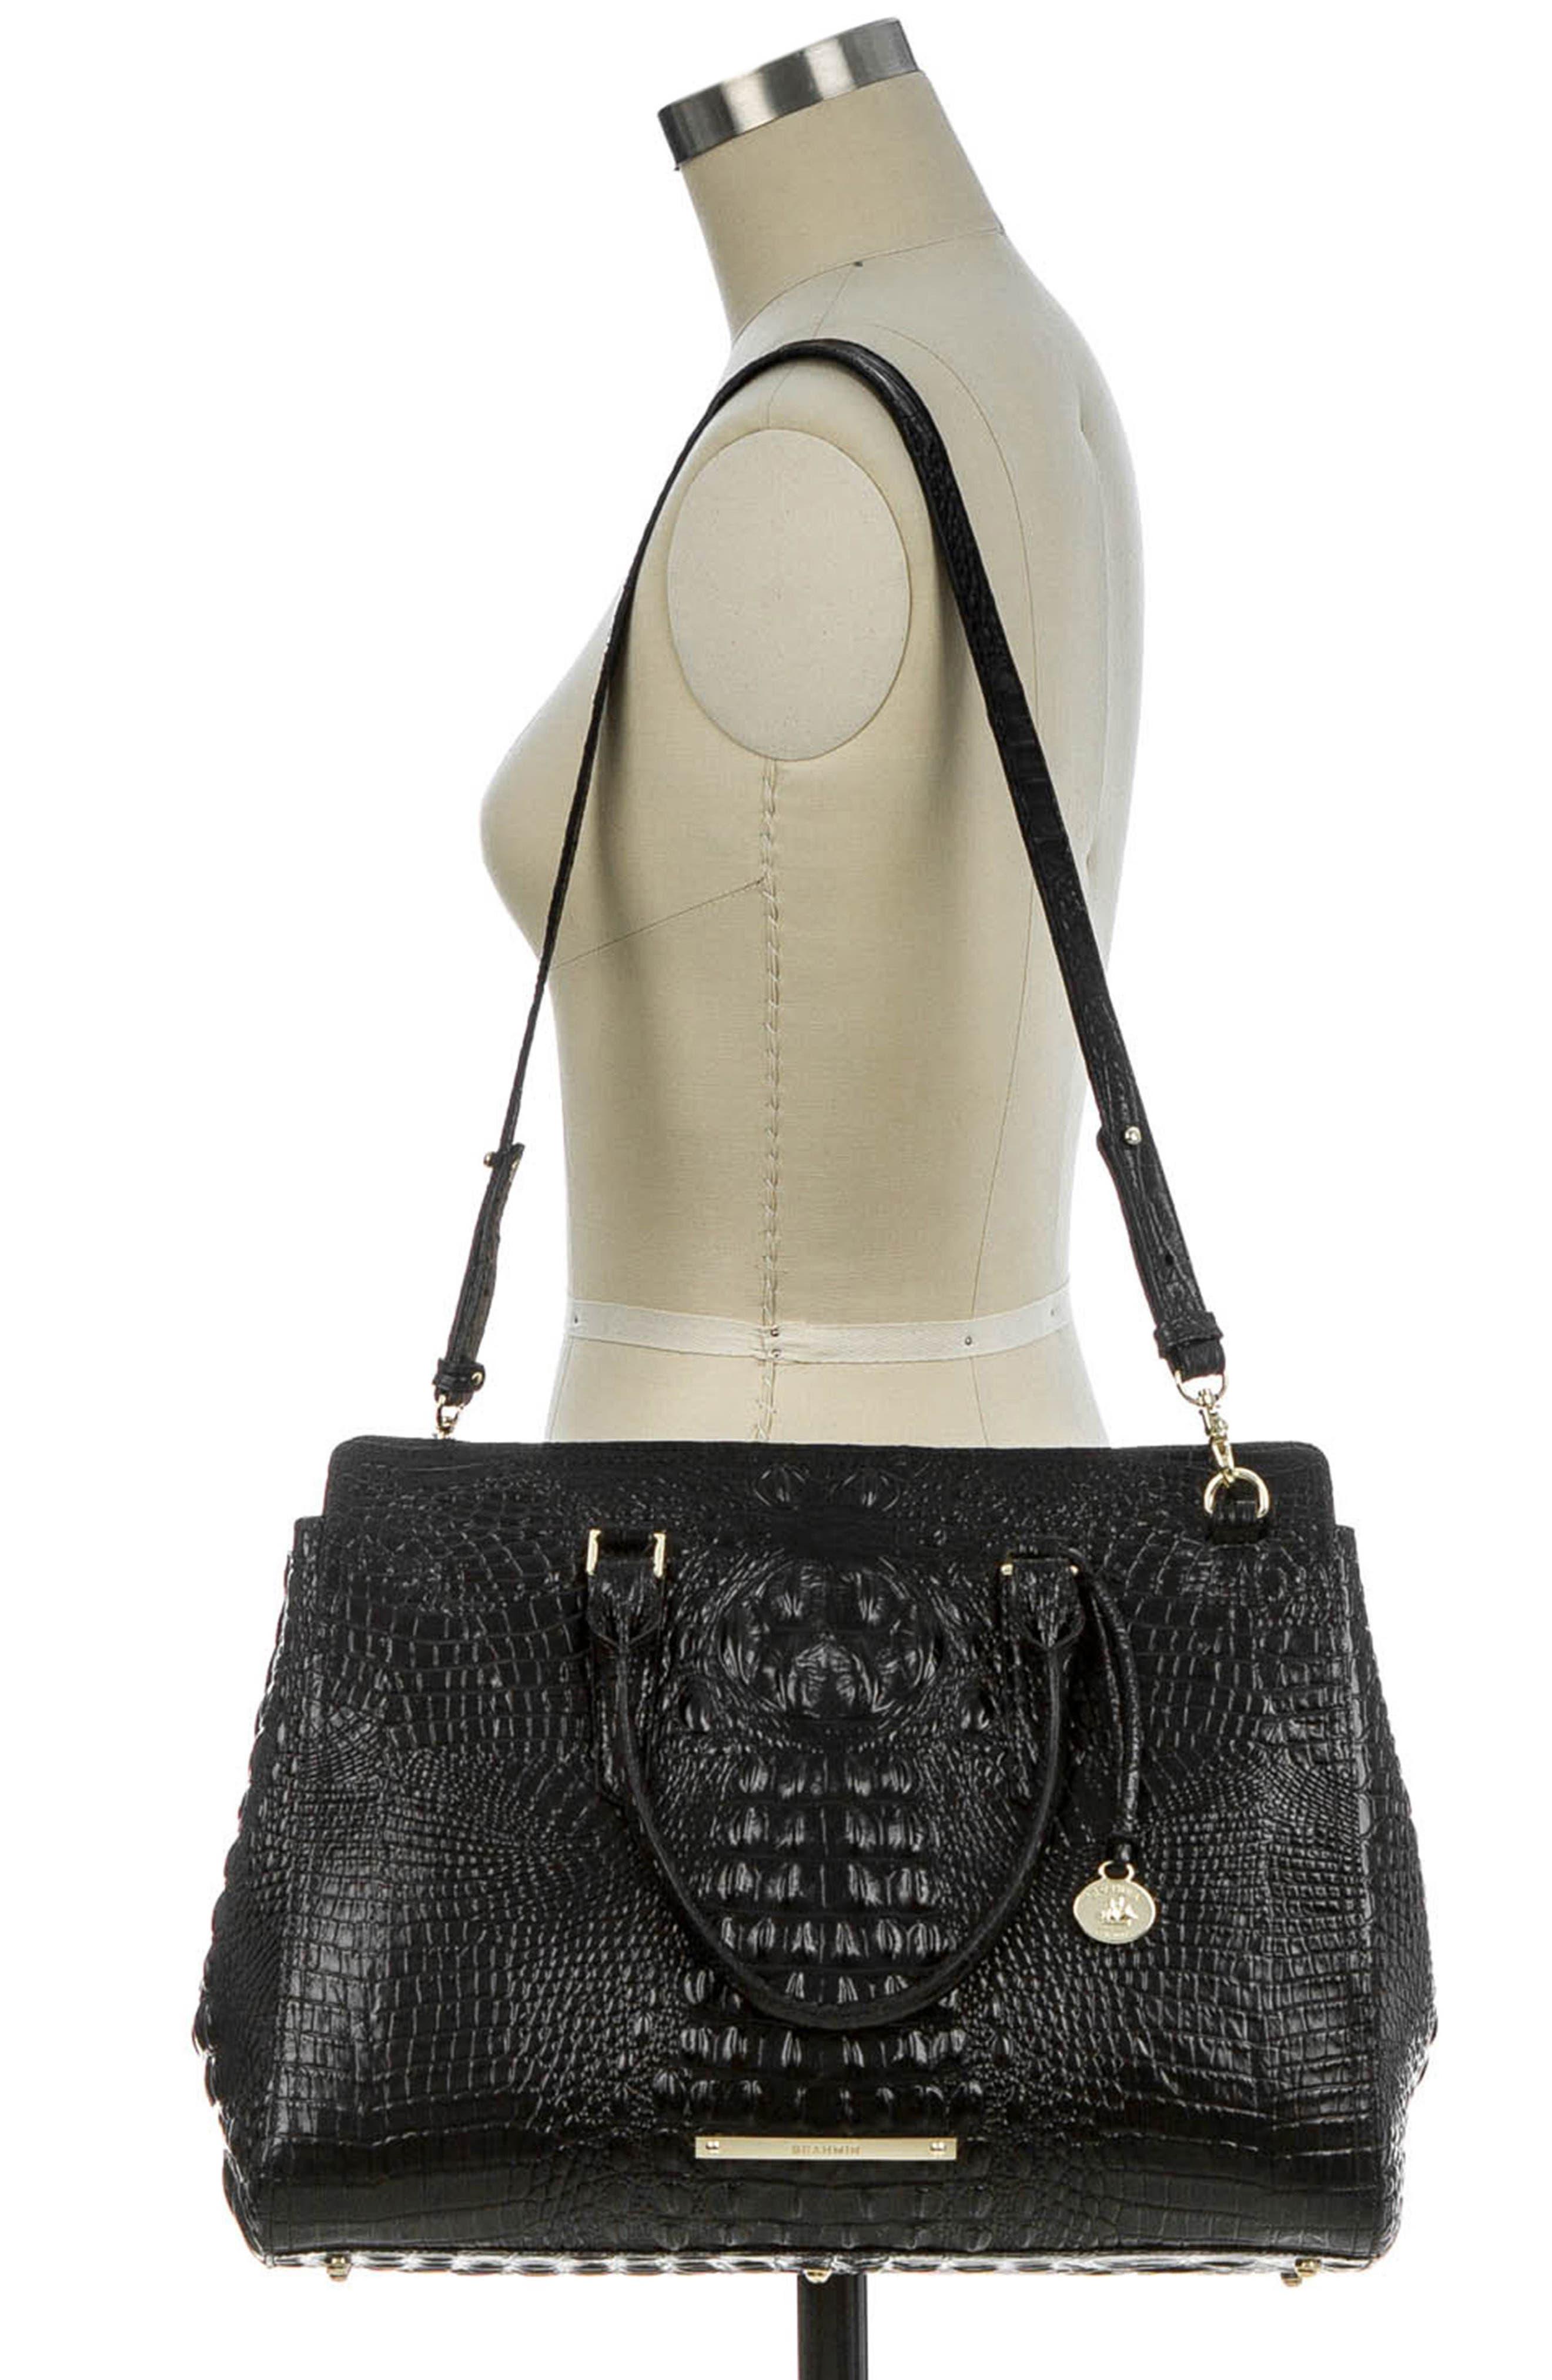 BRAHMIN, Finley Croc Embossed Leather Tote, Alternate thumbnail 2, color, 001